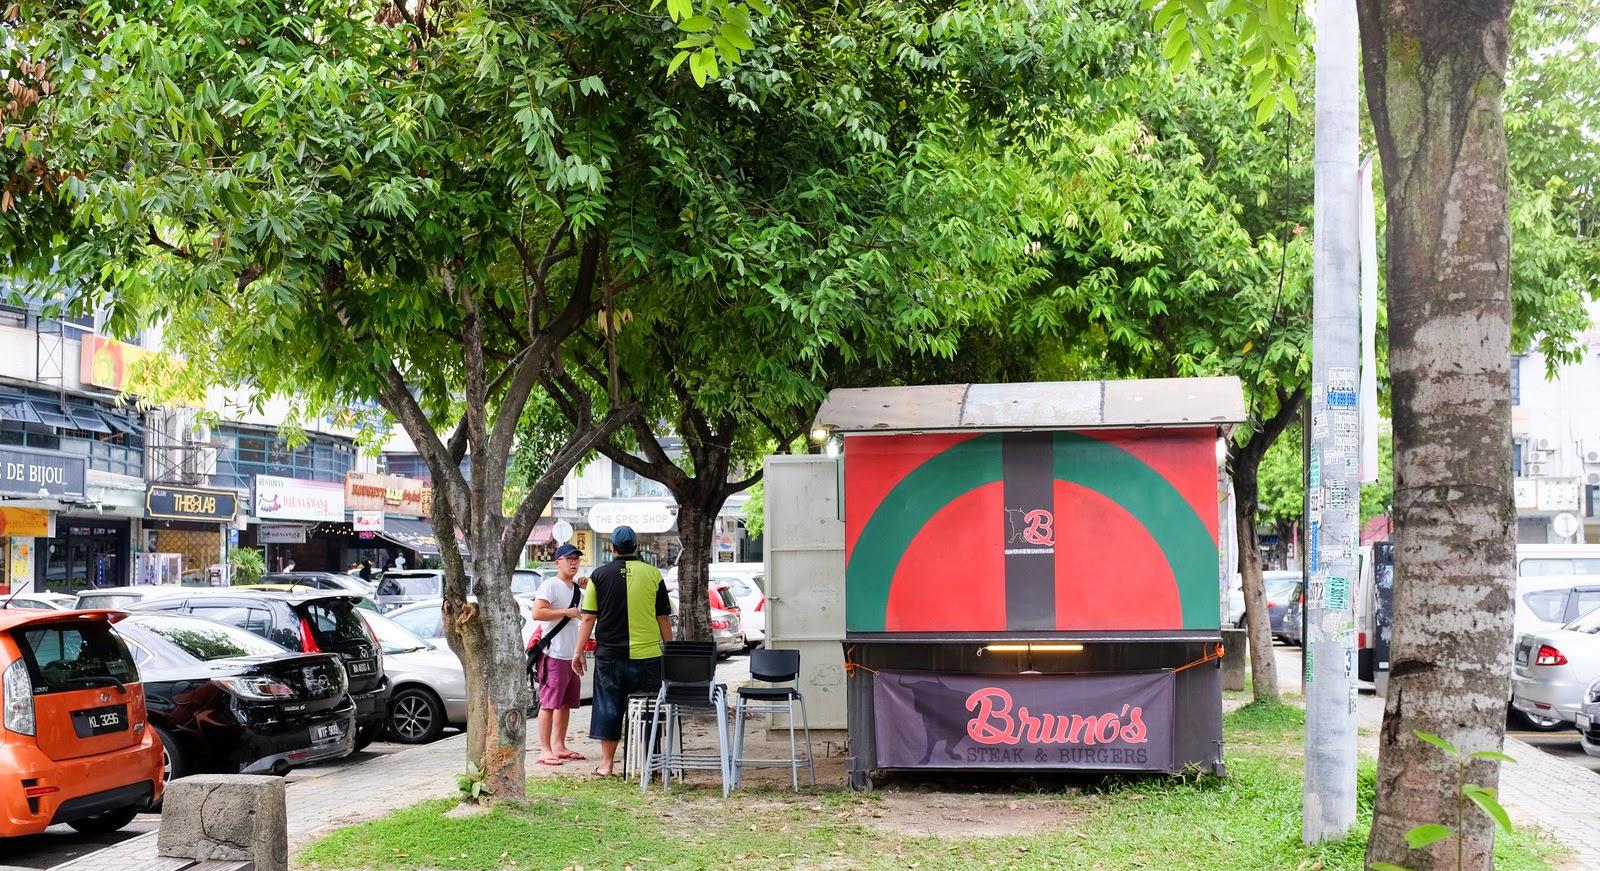 bruno's steaks & burgers @ desa sri hartamas